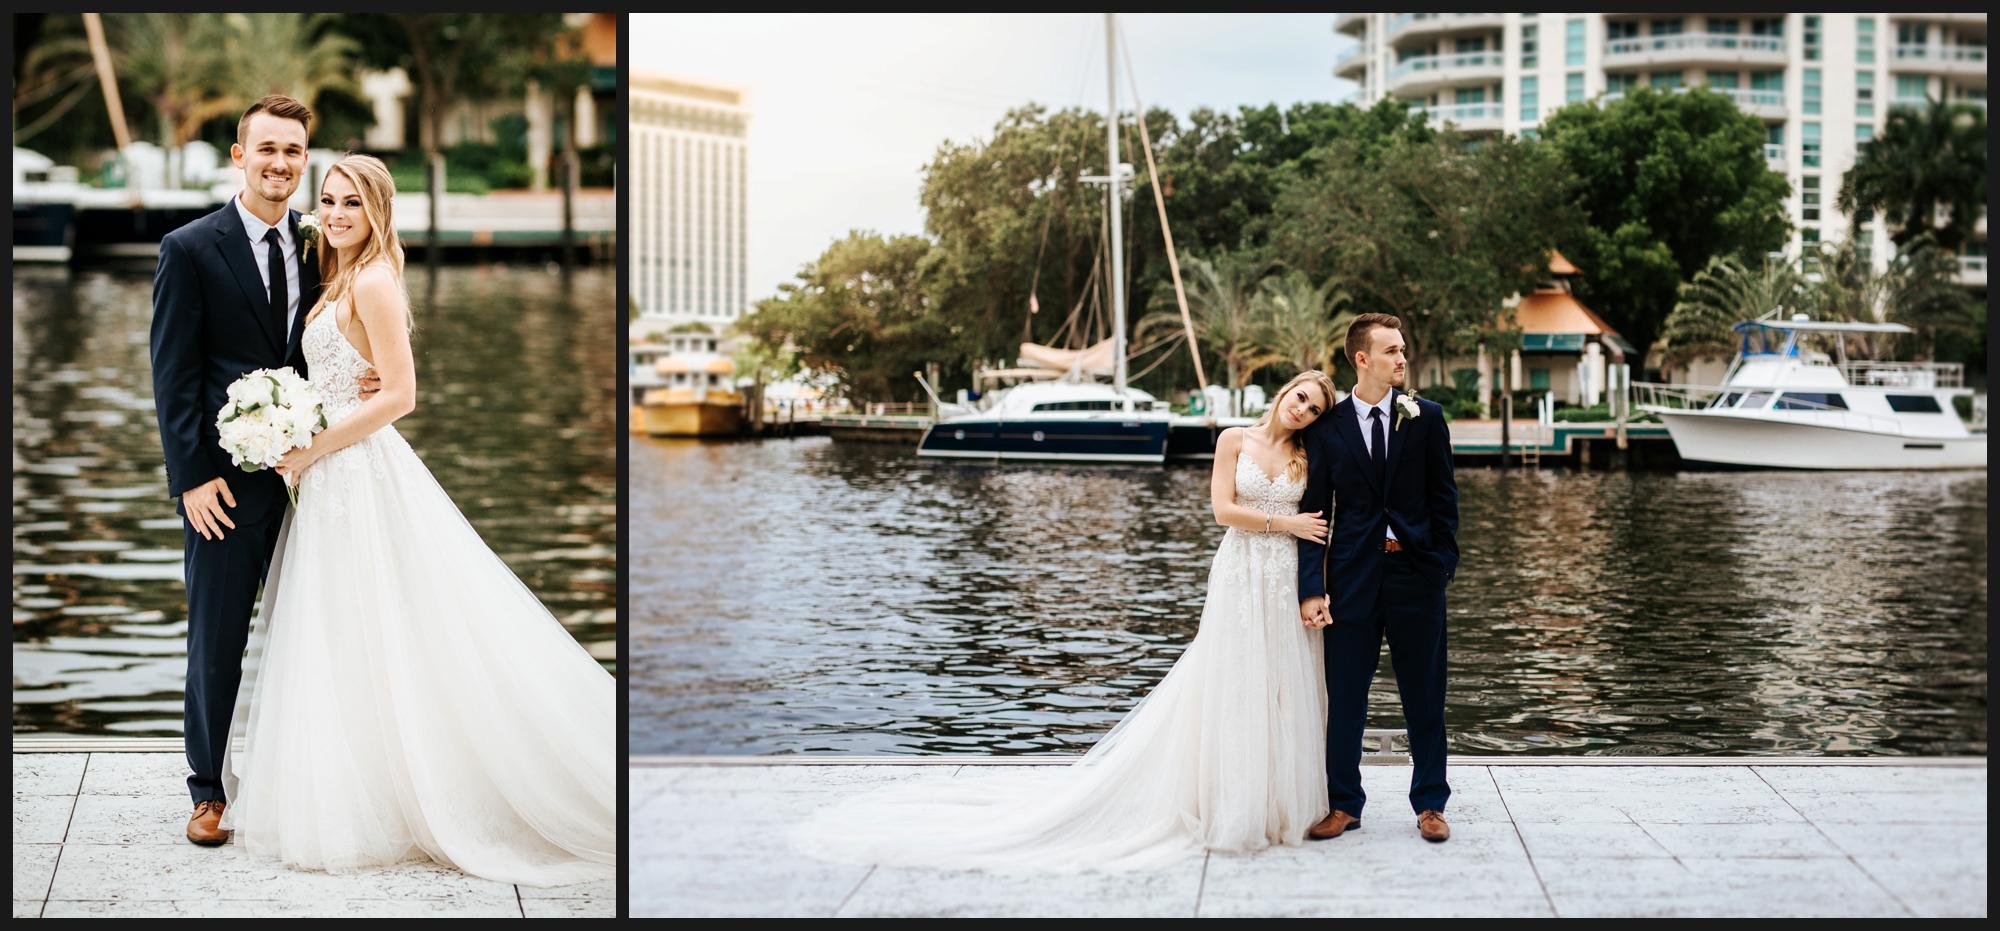 Orlando-Wedding-Photographer-destination-wedding-photographer-florida-wedding-photographer-bohemian-wedding-photographer_0011.jpg